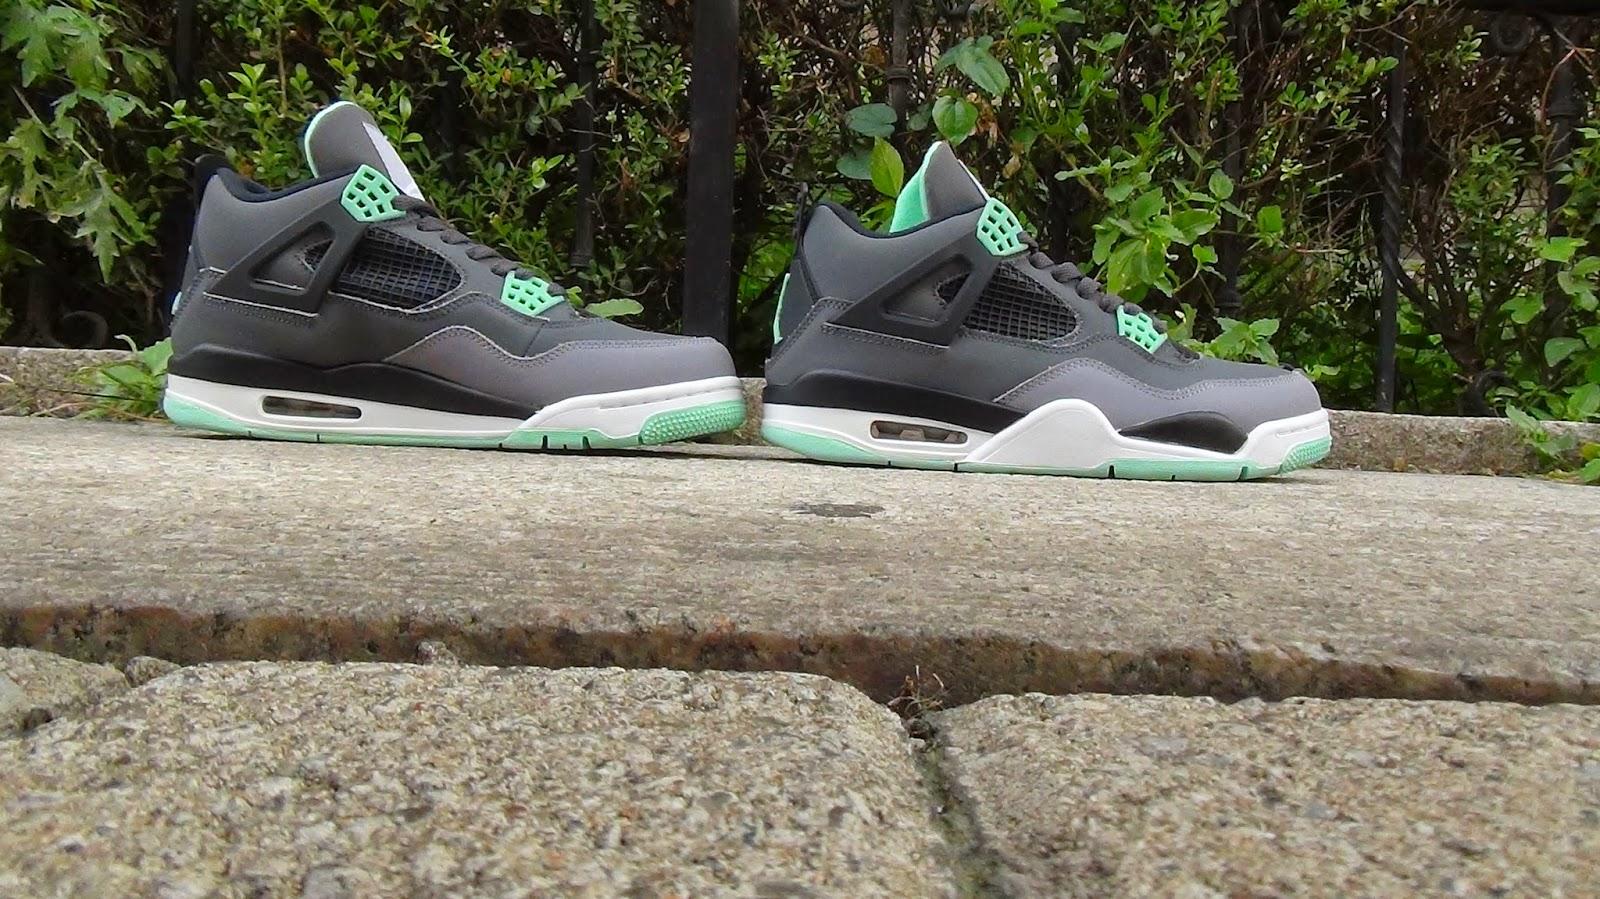 buy popular 2813a 9a209 repsperfect: Air Jordan Green Glow 4S Air Jordan 4 Green ...